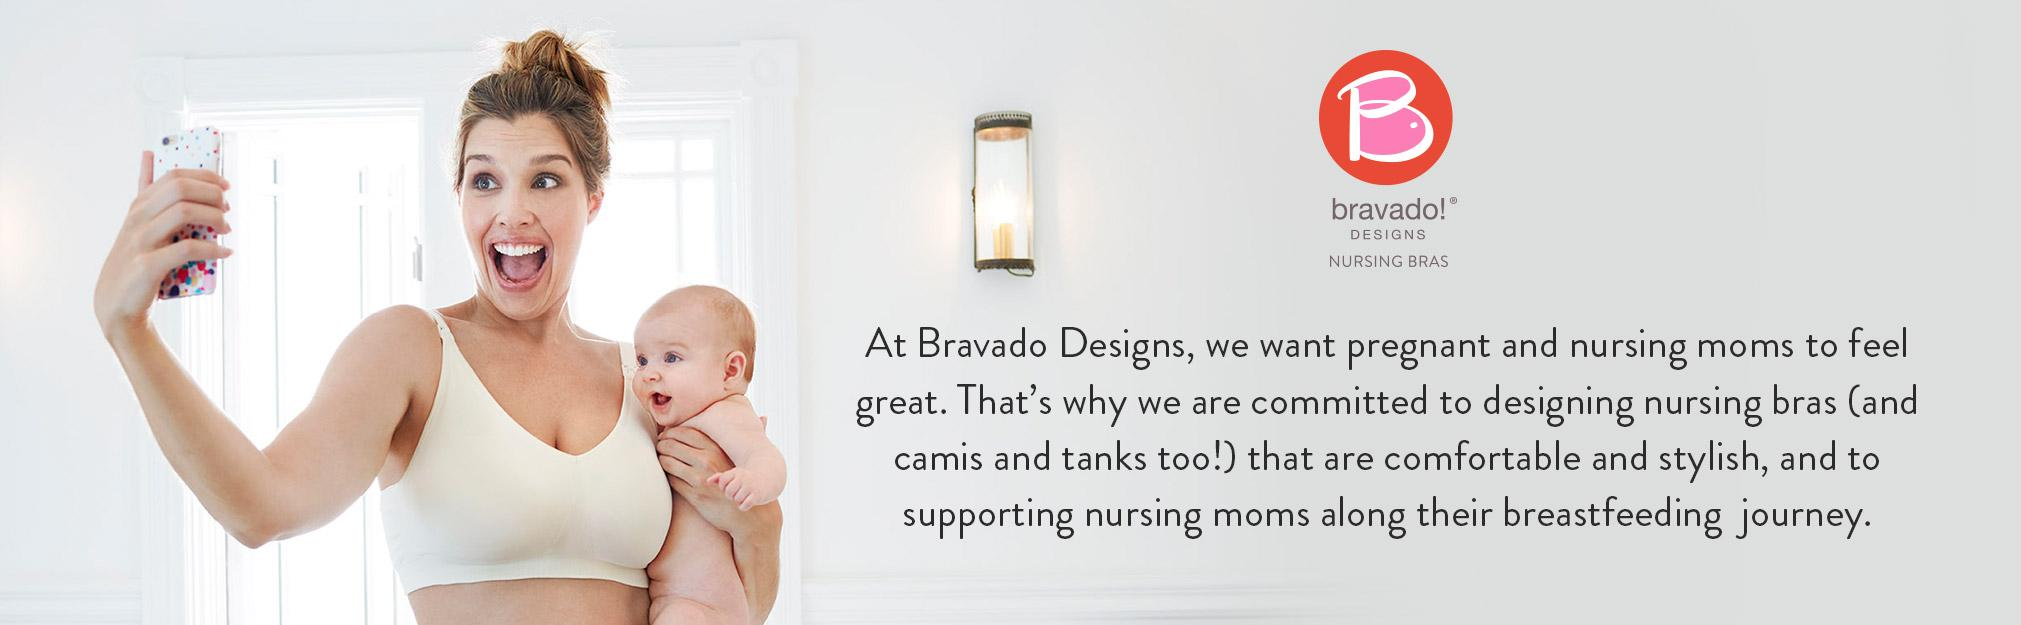 d70d02f6f2 Bravado! Designs Women s Maternity Ballet Nursing Bra  Amazon.ca ...